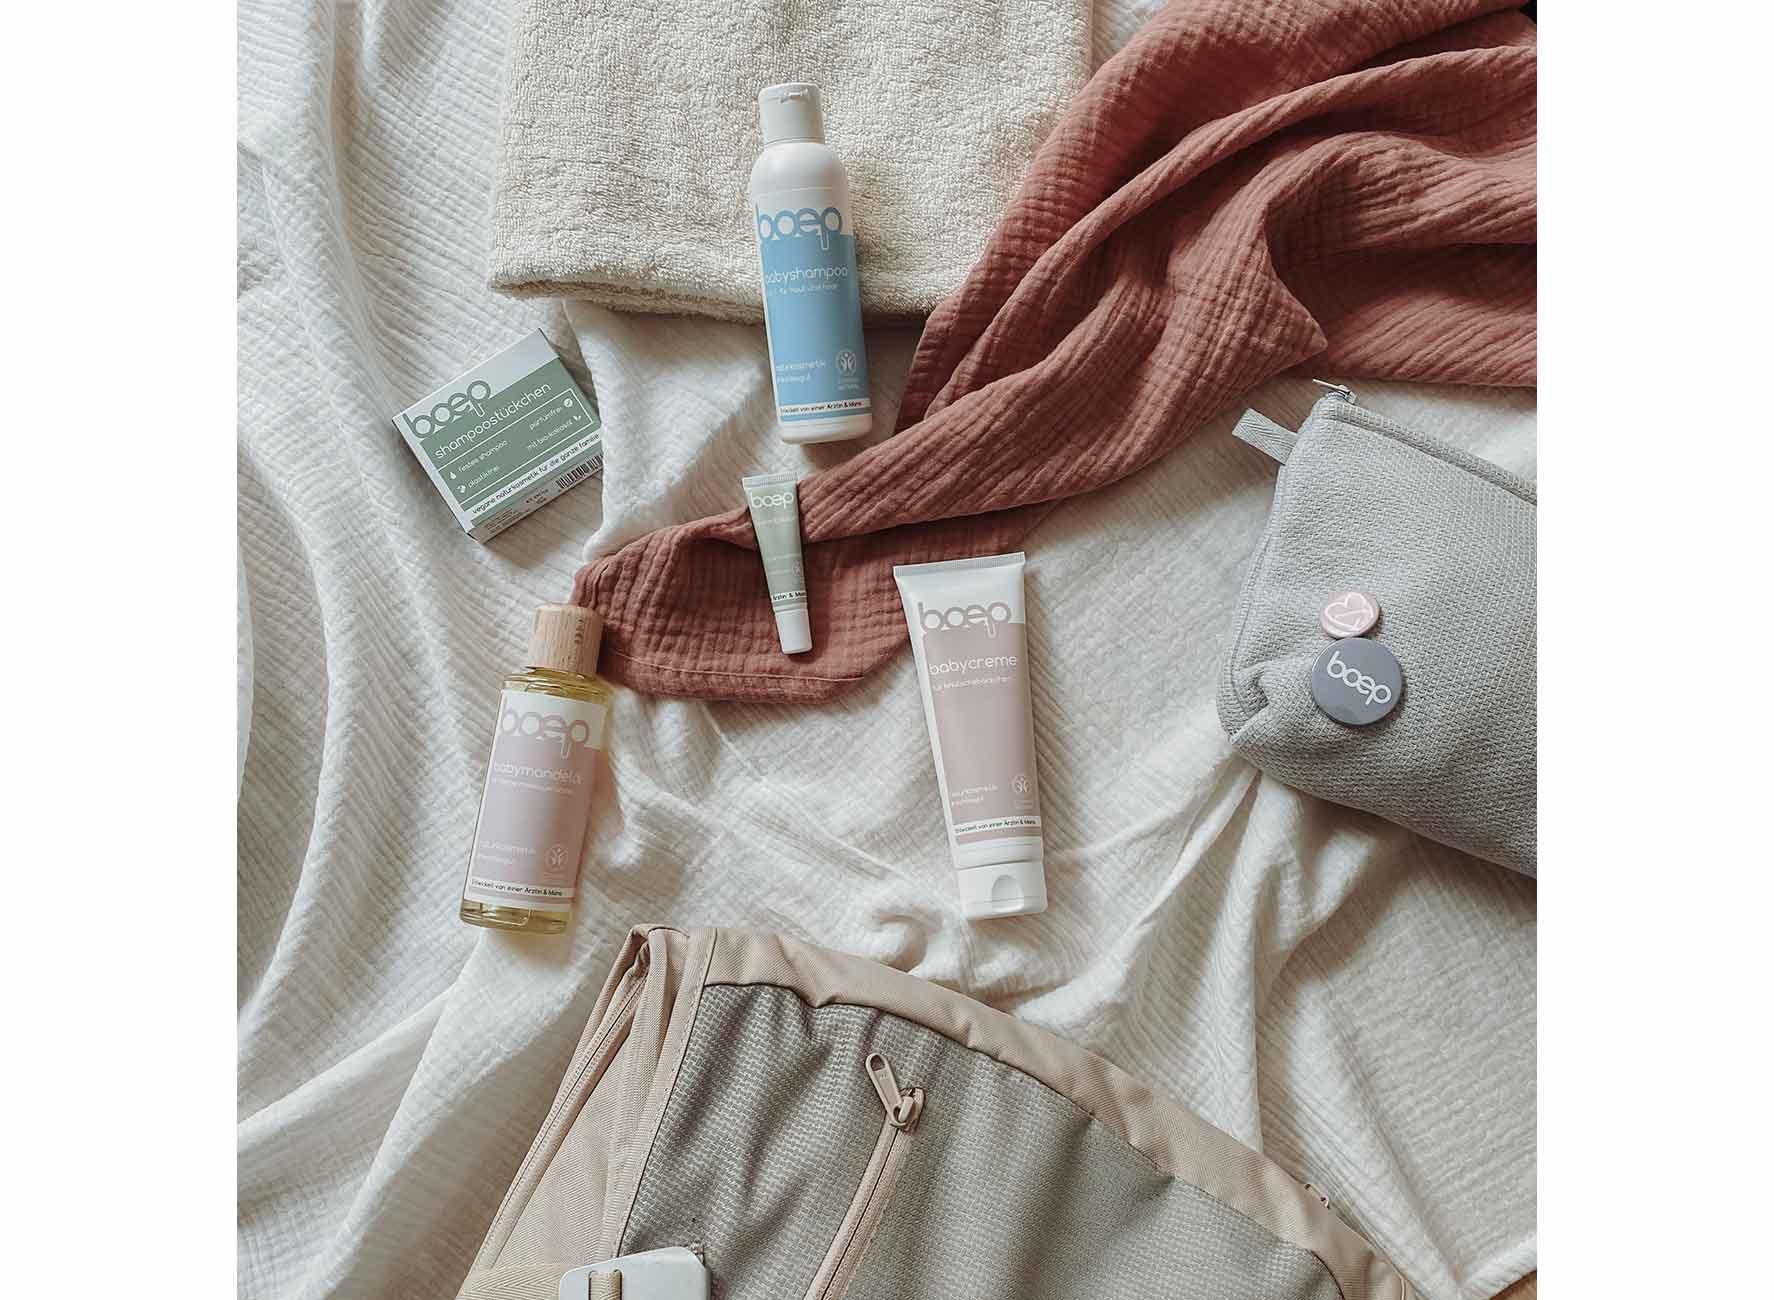 Afbeelding boep Baby shampoo bodywash 2in1